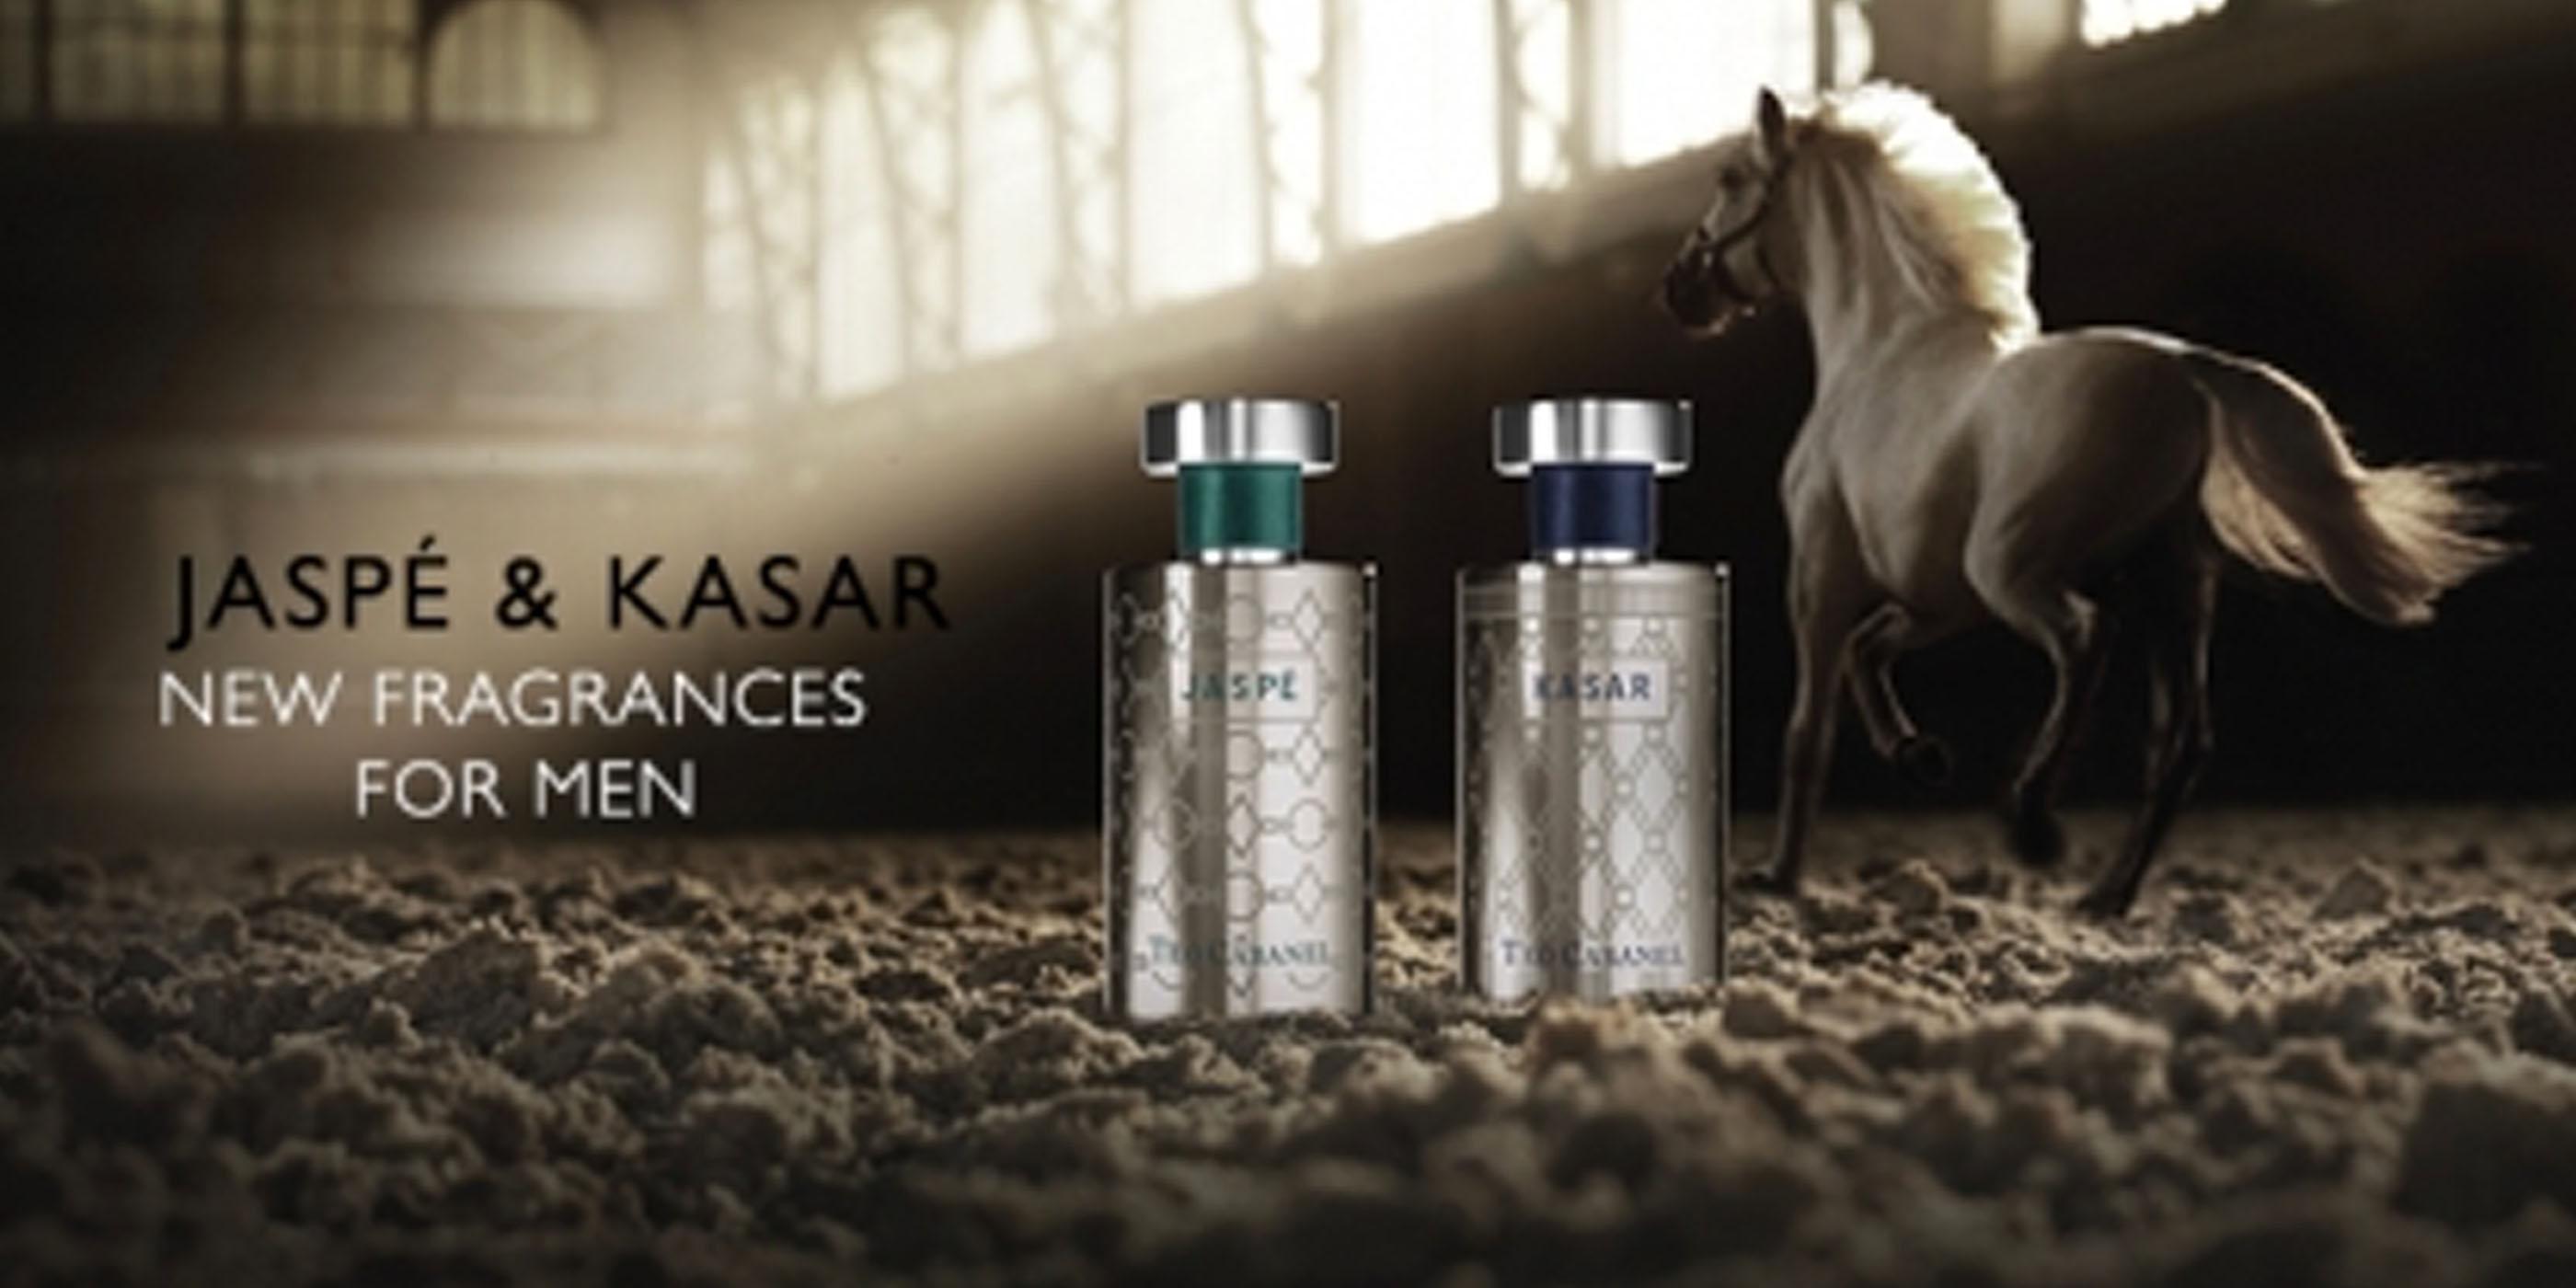 Teo Cabanel Fragrance for men Jasper & Kasar